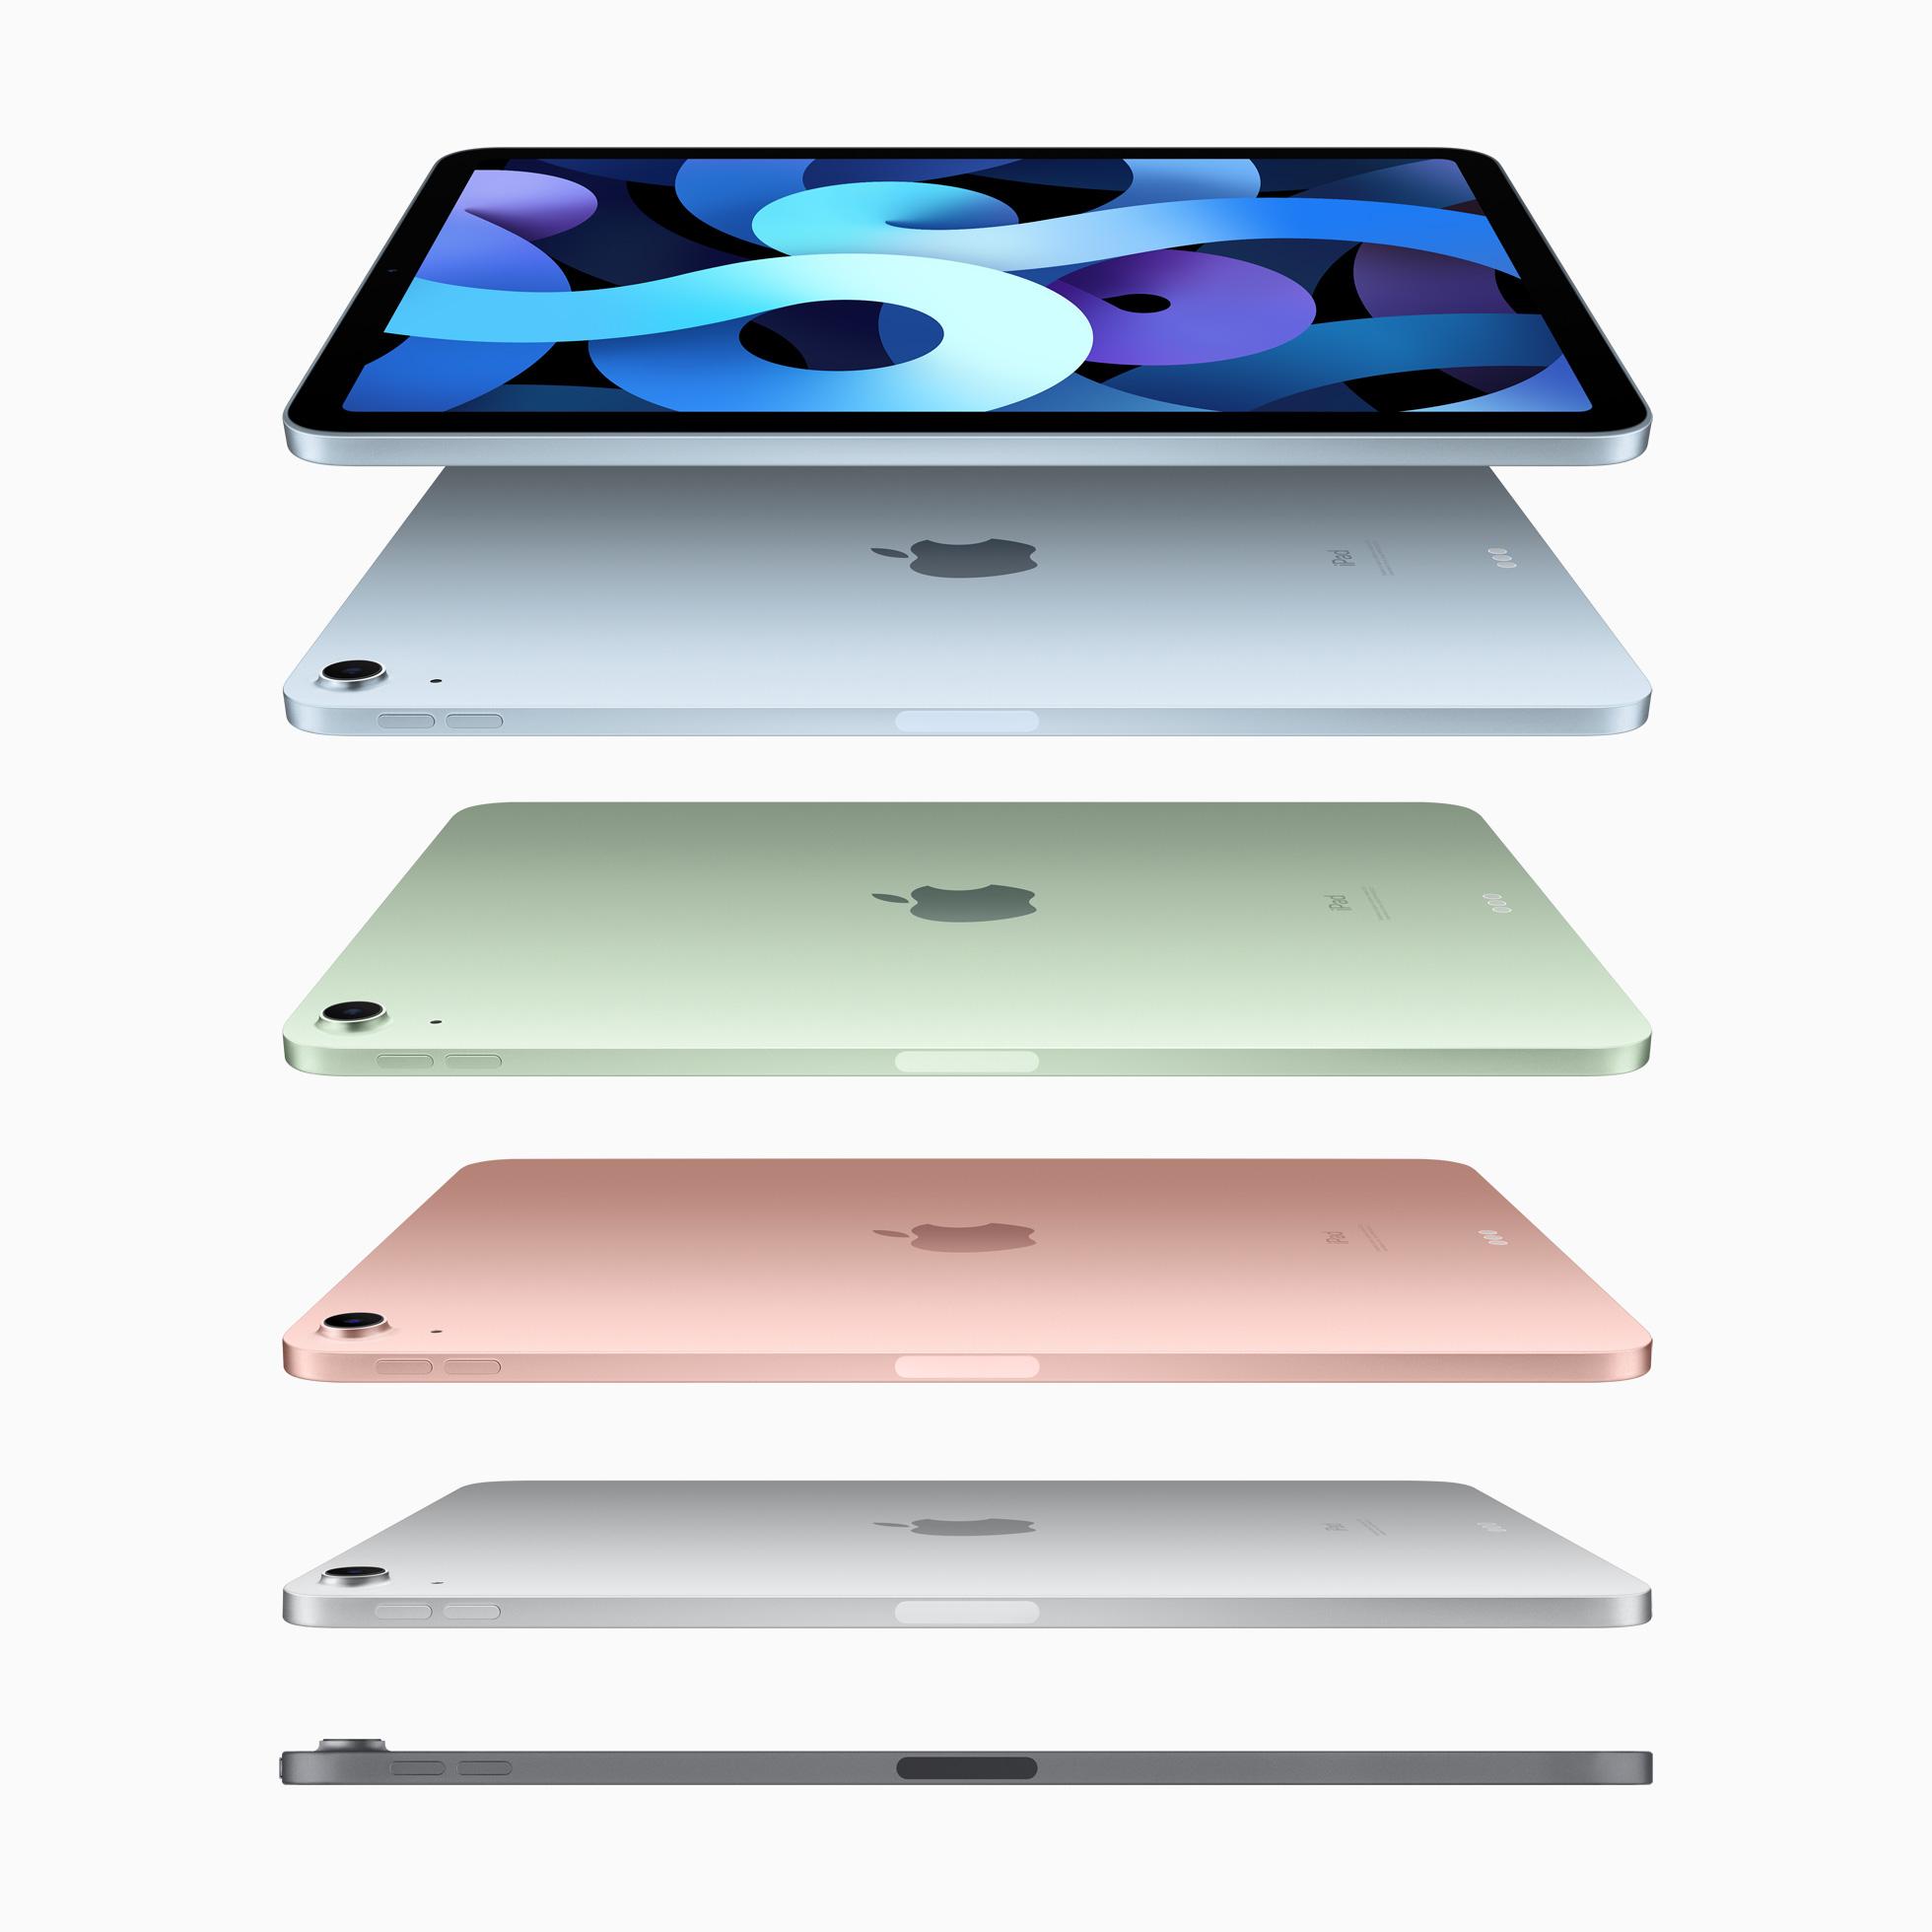 apple new ipad air new design 09152020